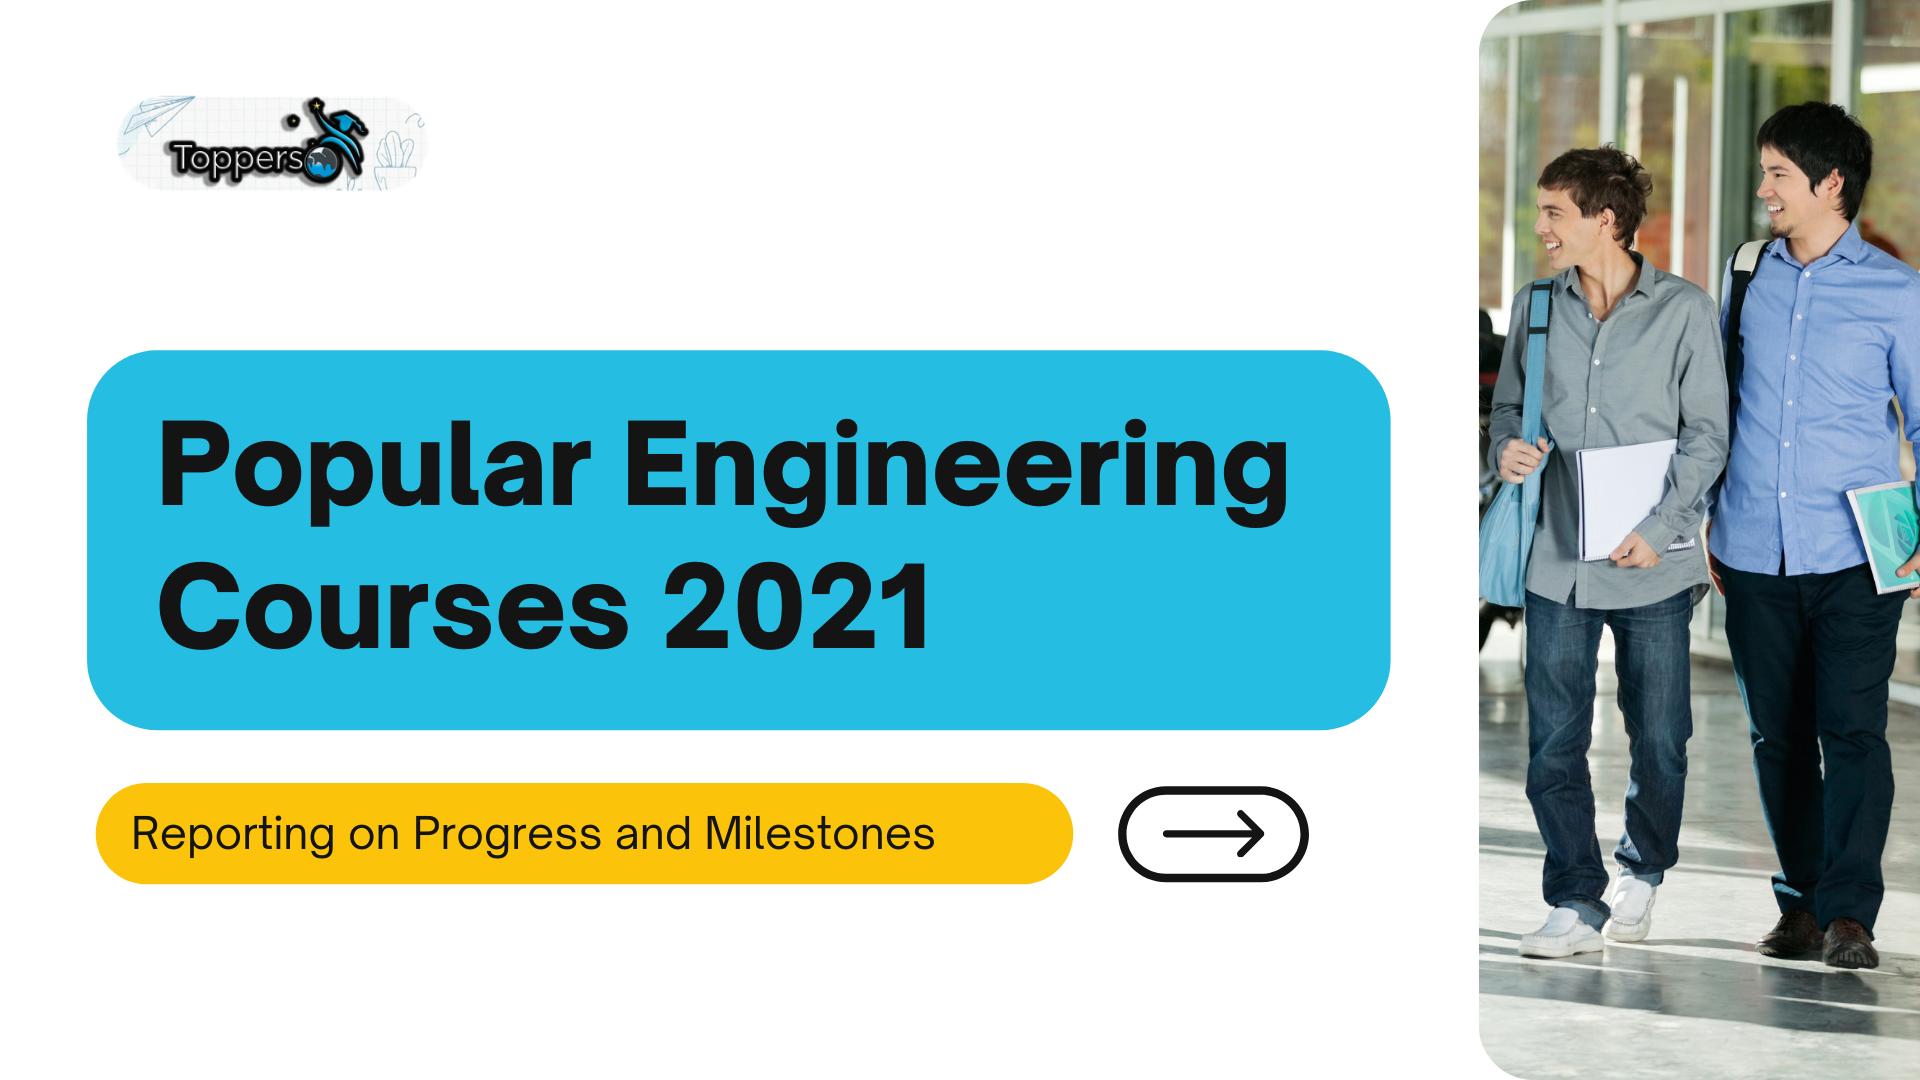 Popular Engineering Courses 2021